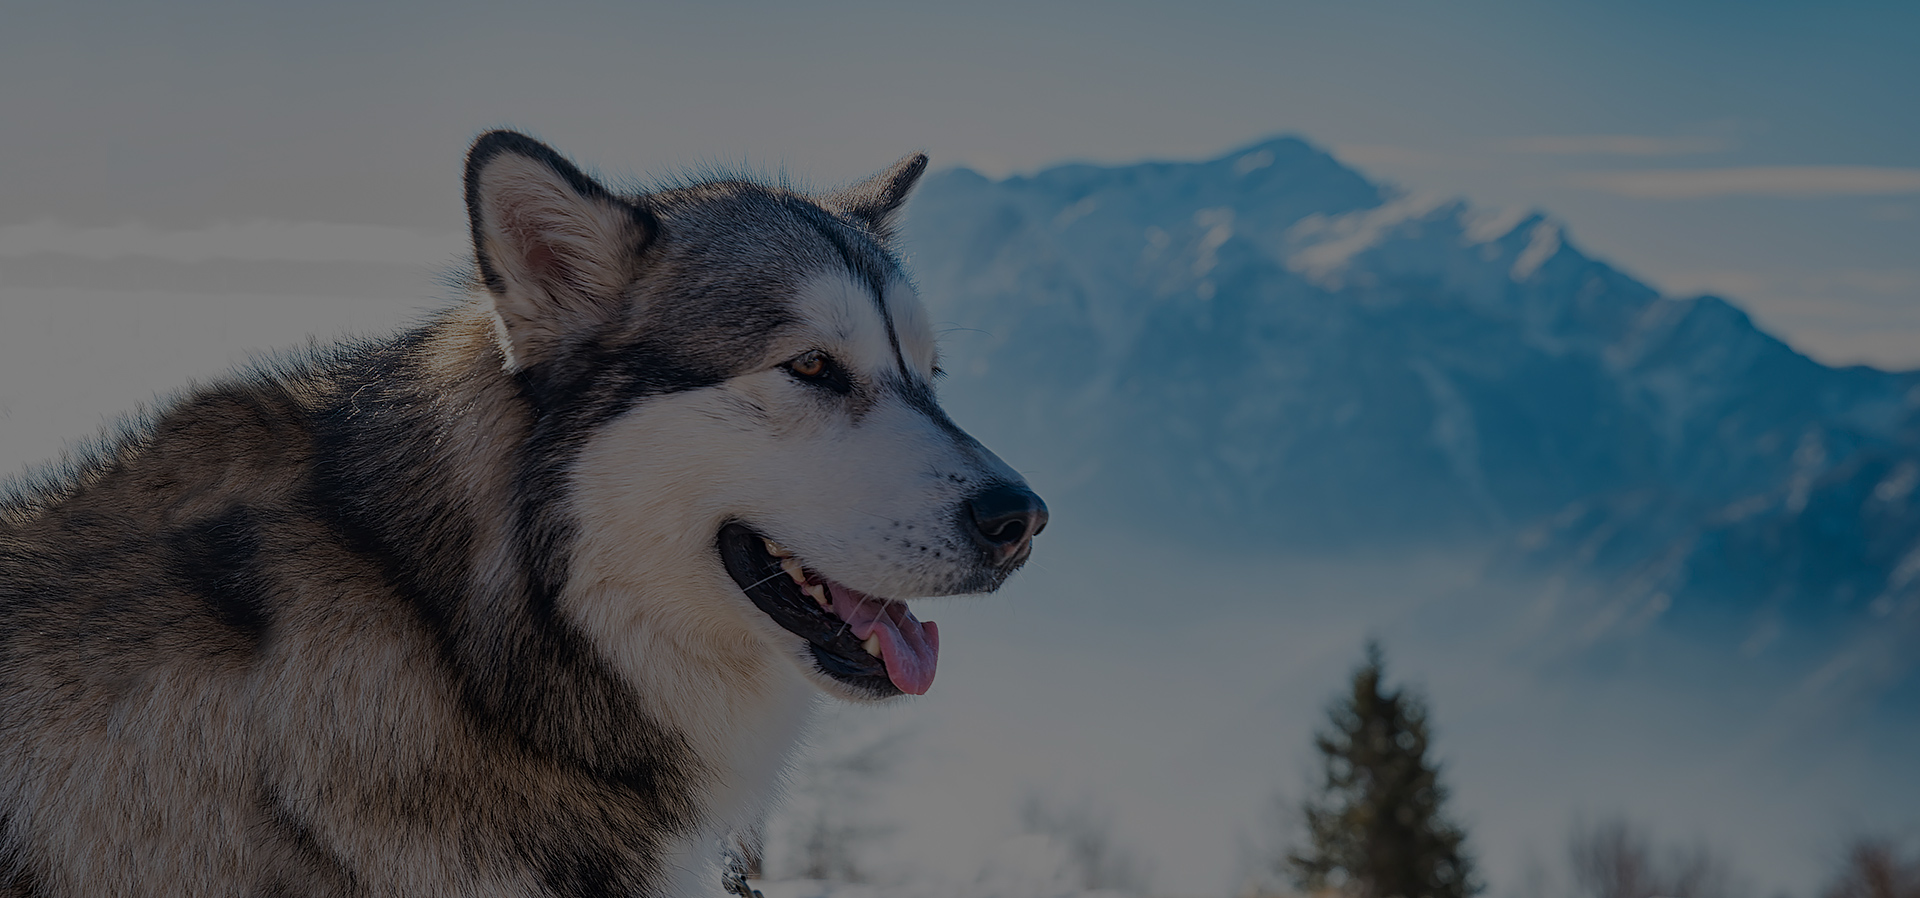 The Alaska State <br>Veterinary Medical Association